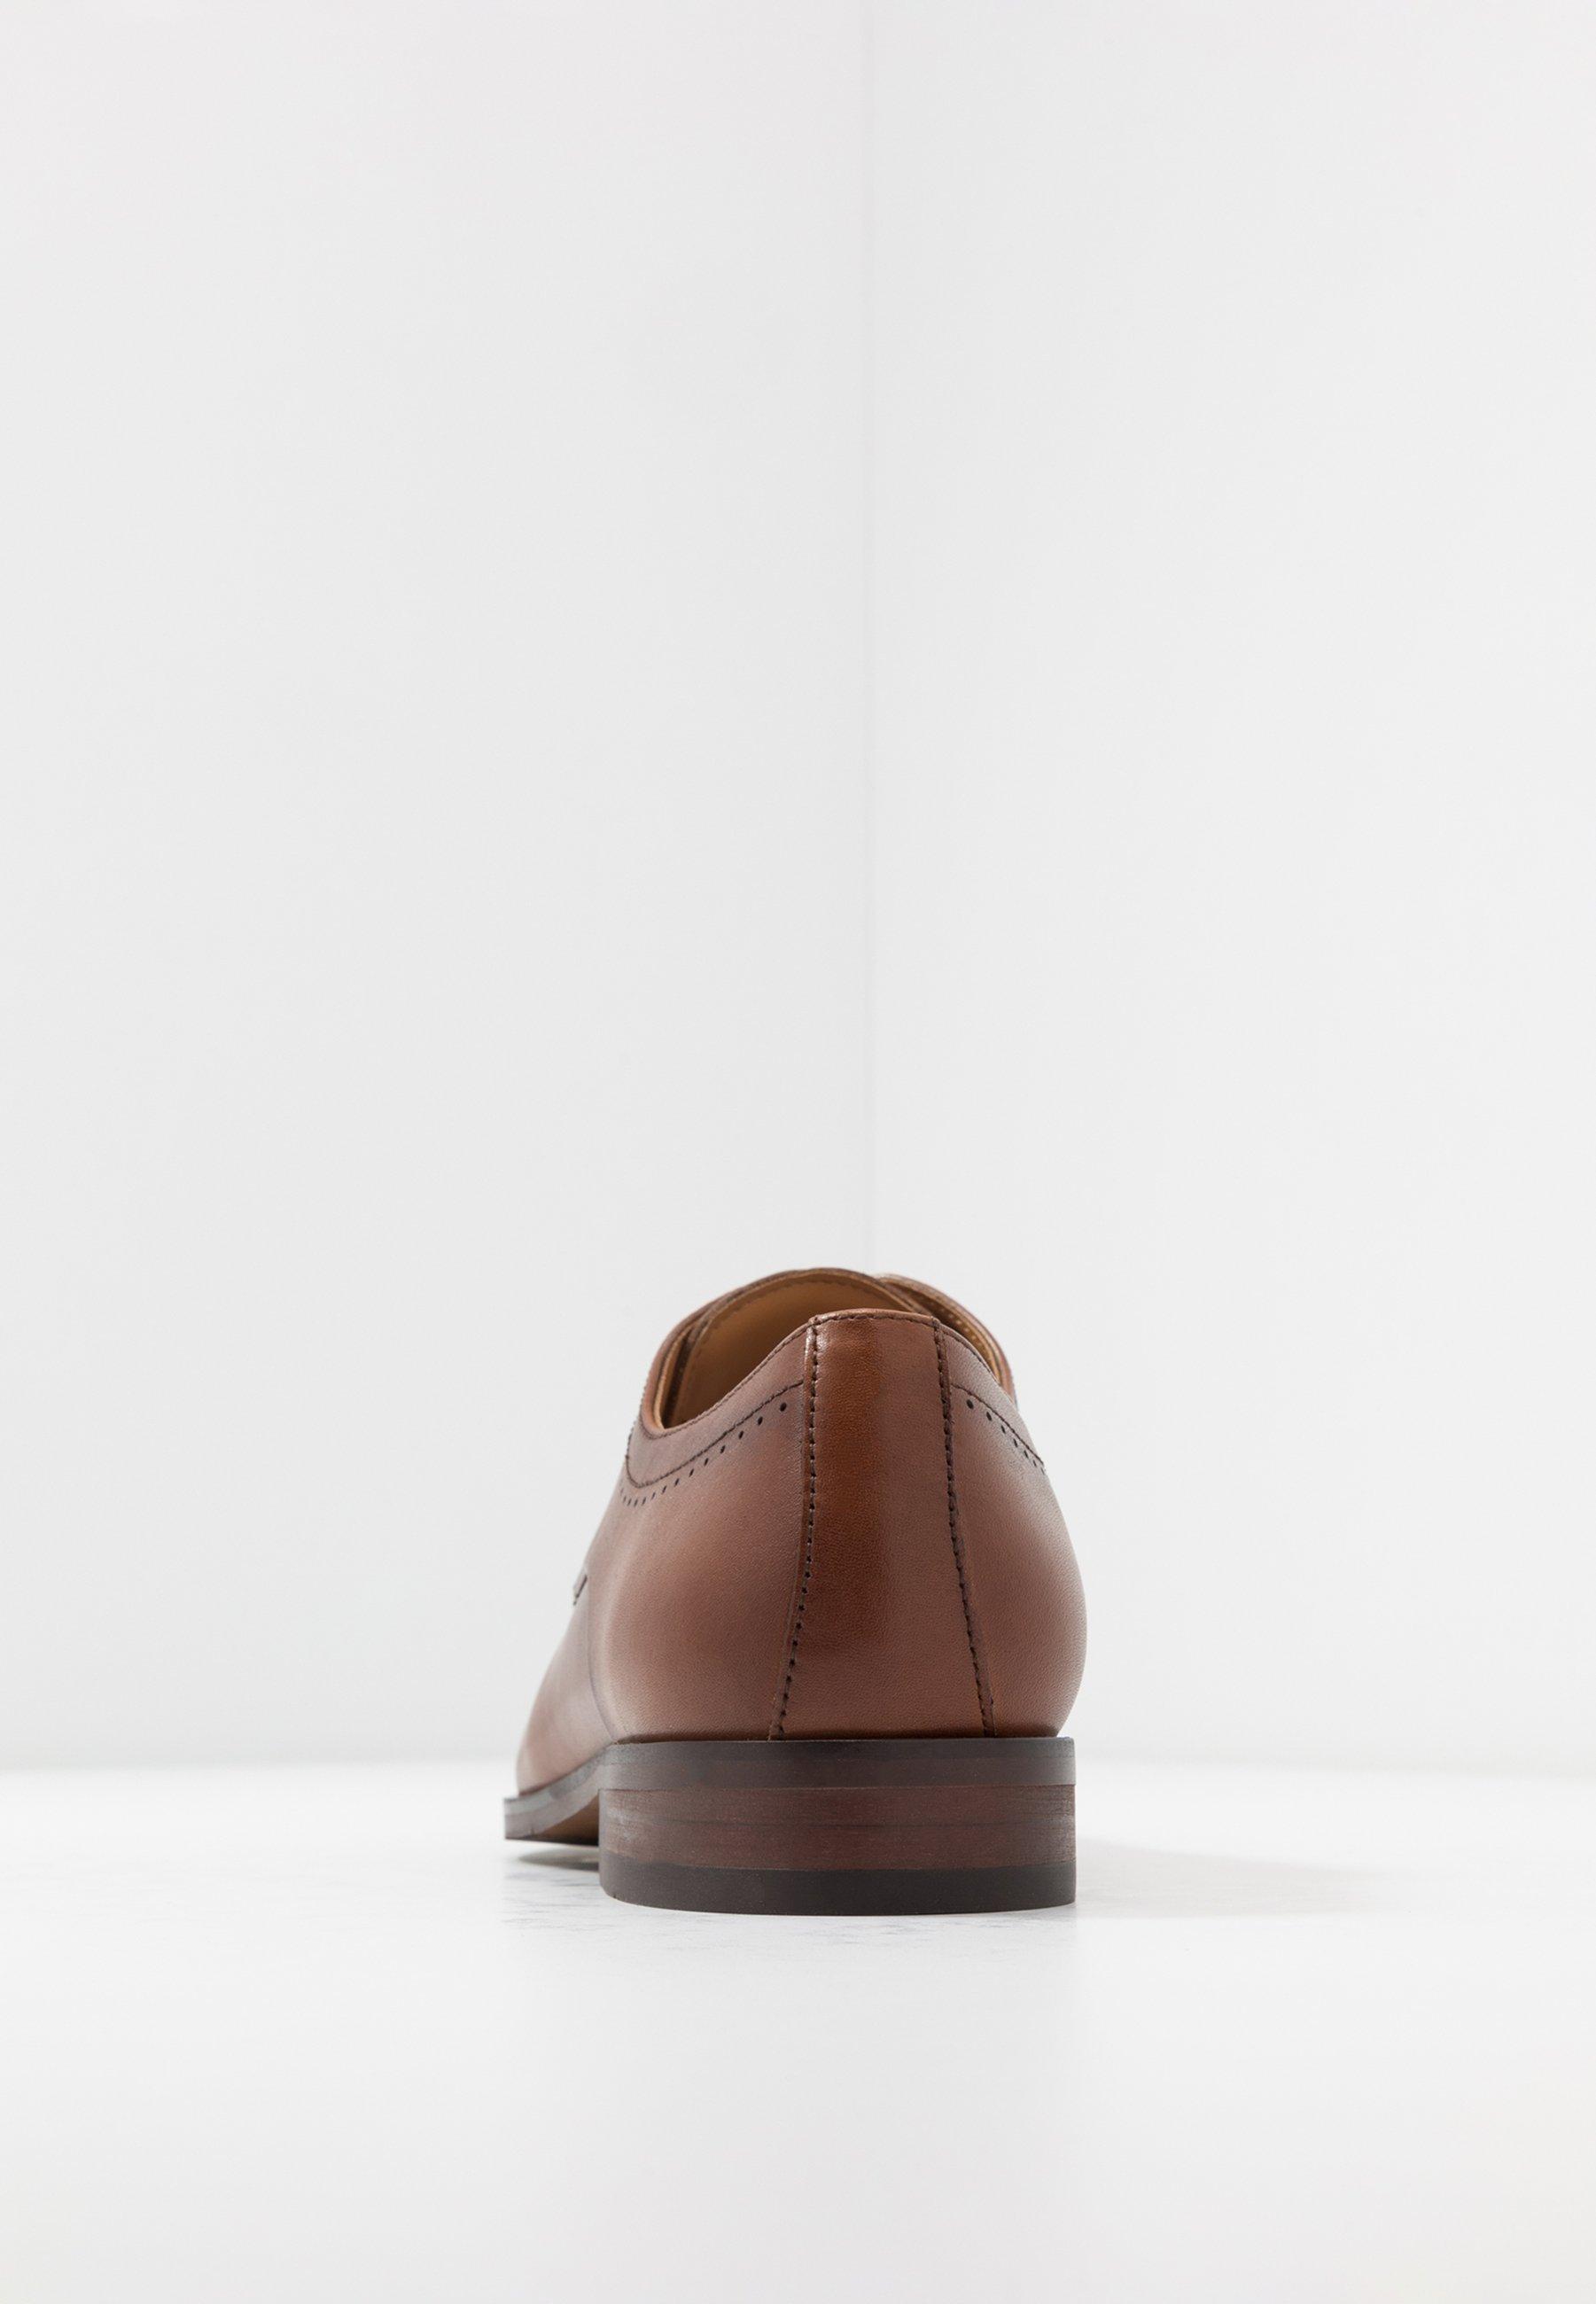 Office Looktoe Cap Formal - Stringate Eleganti Tan